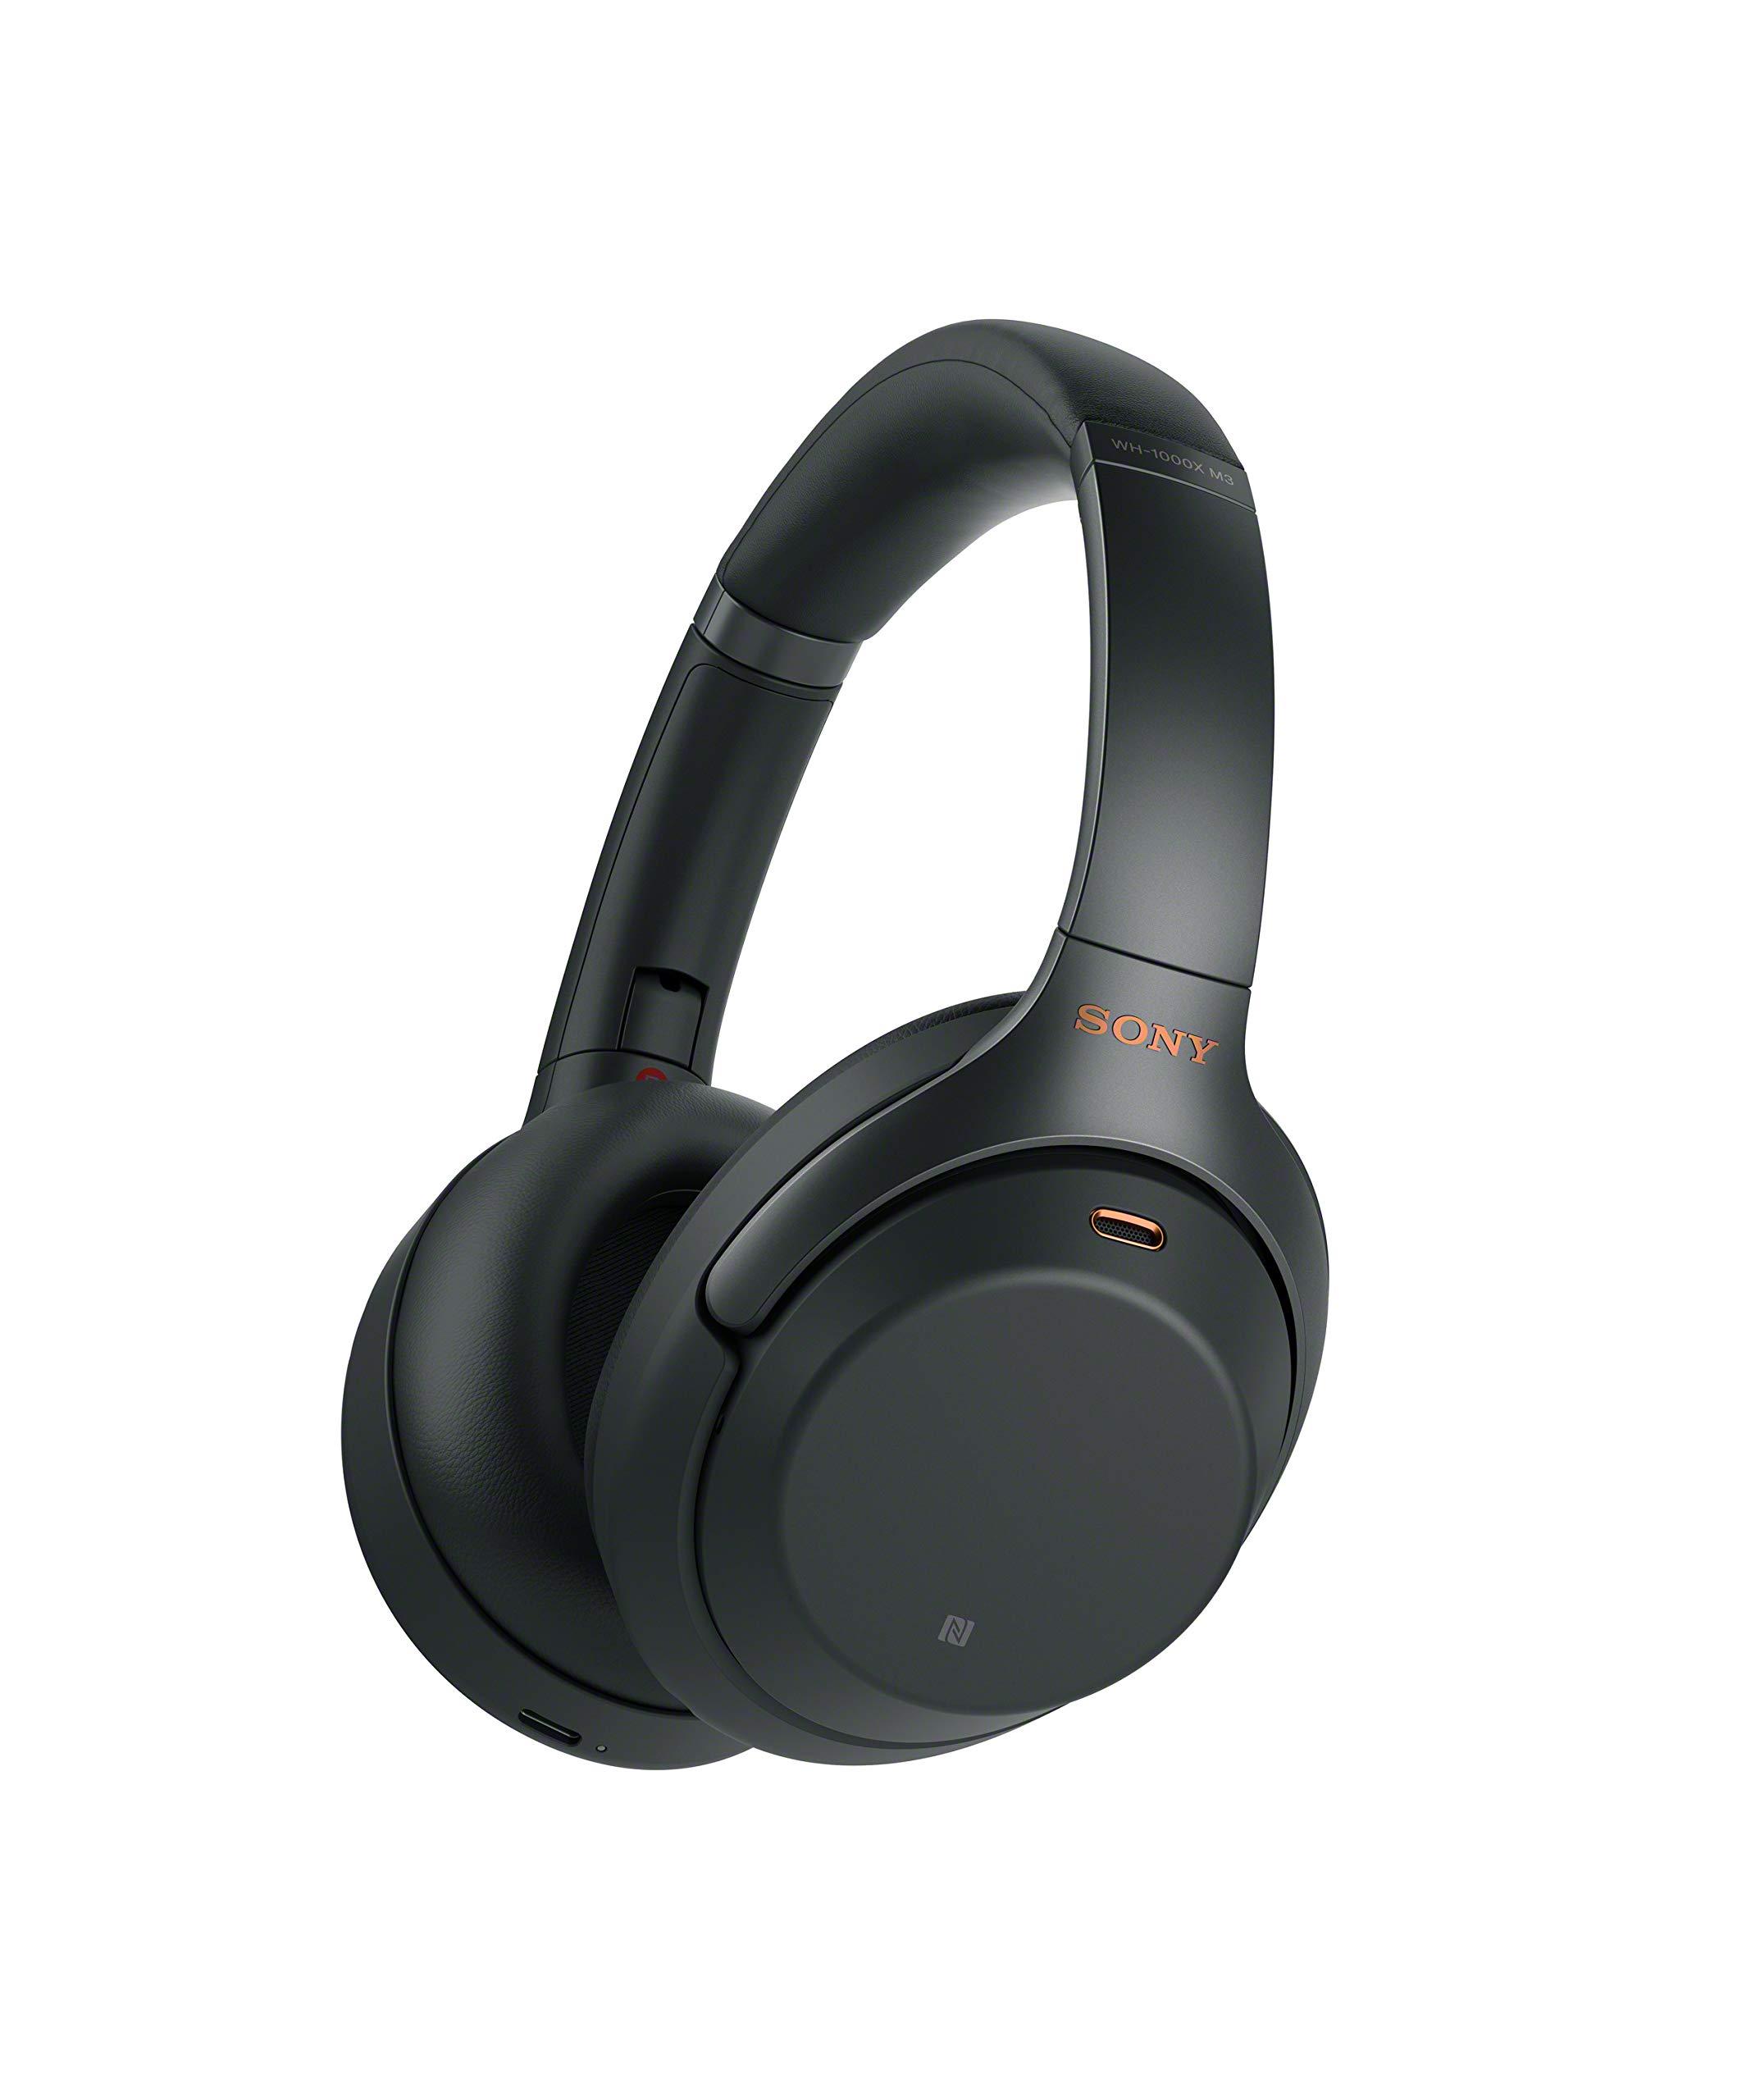 ویکالا · خرید  اصل اورجینال · خرید از آمازون · Sony WH1000XM3 Wireless Industry Leading Noise Canceling Over Ear Headphones, Black (WH-1000XM3/B) wekala · ویکالا